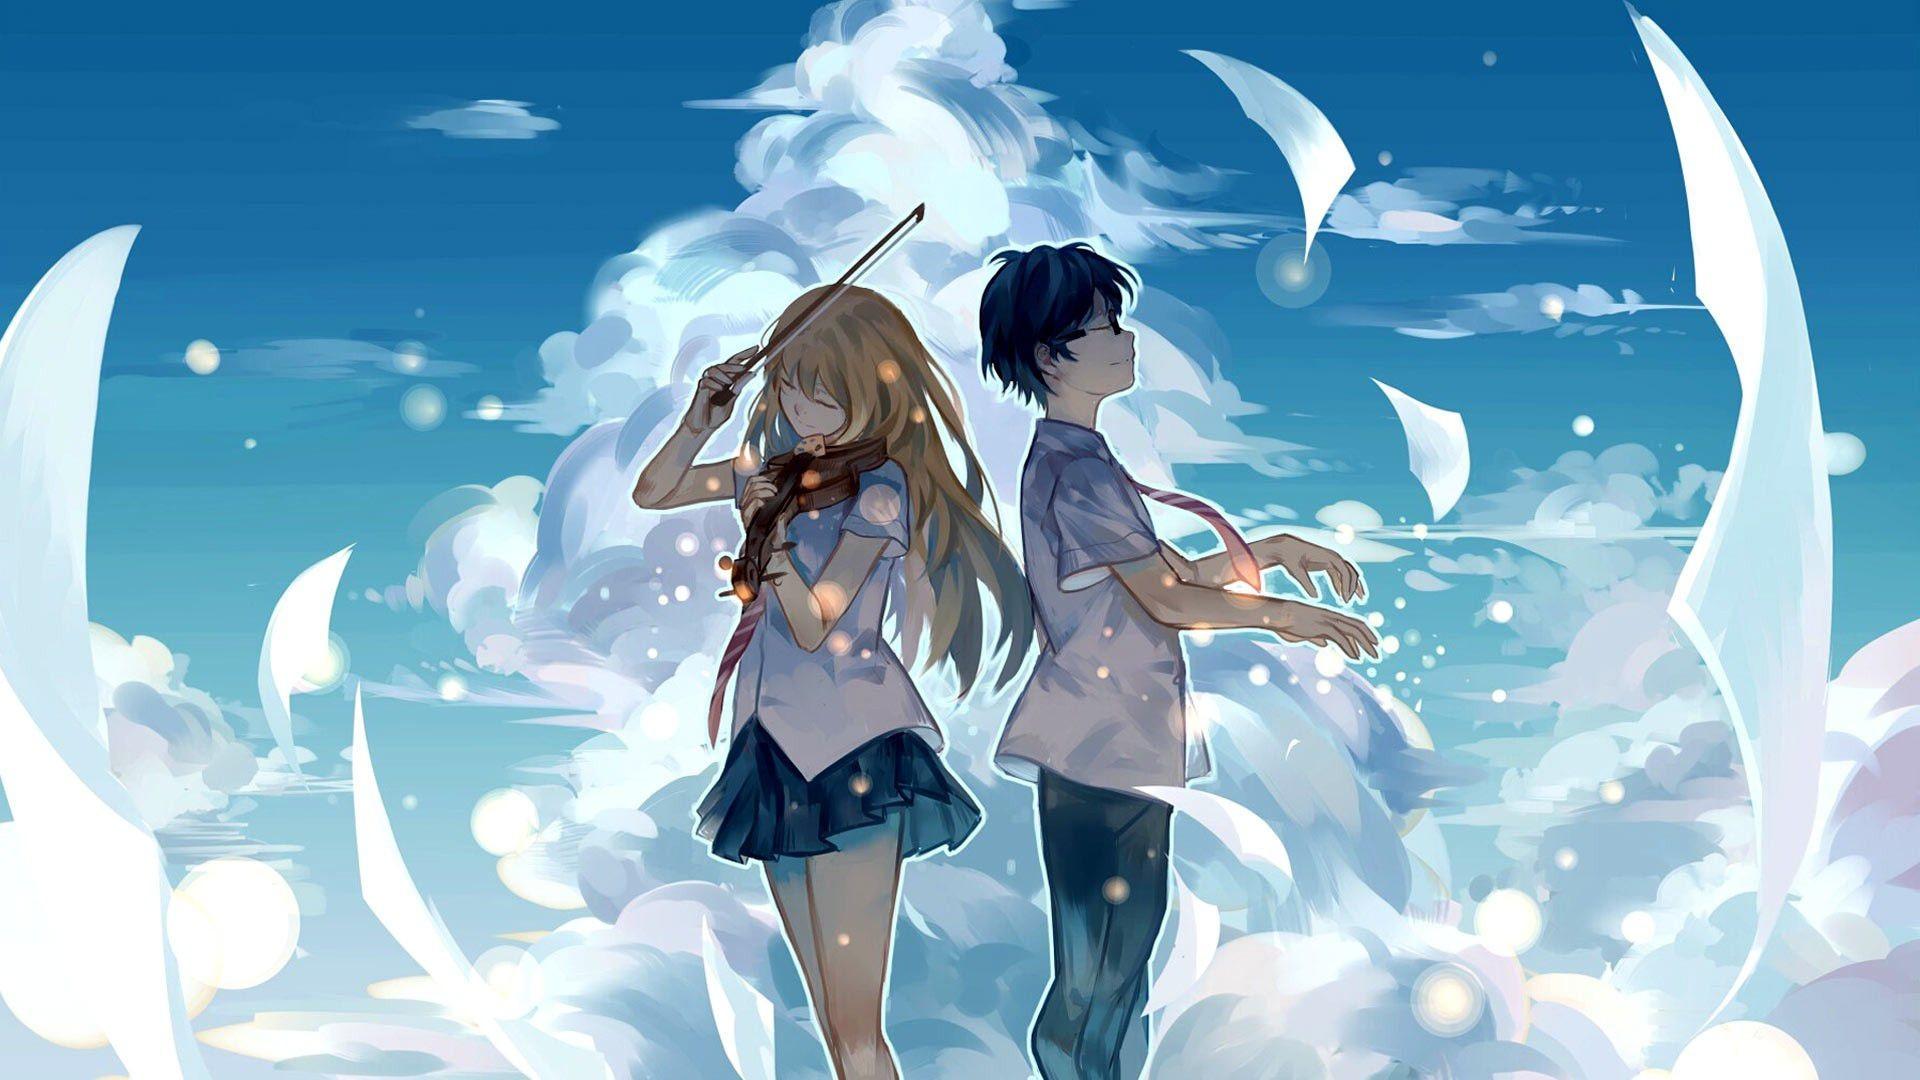 Anime couples hd wallpaper